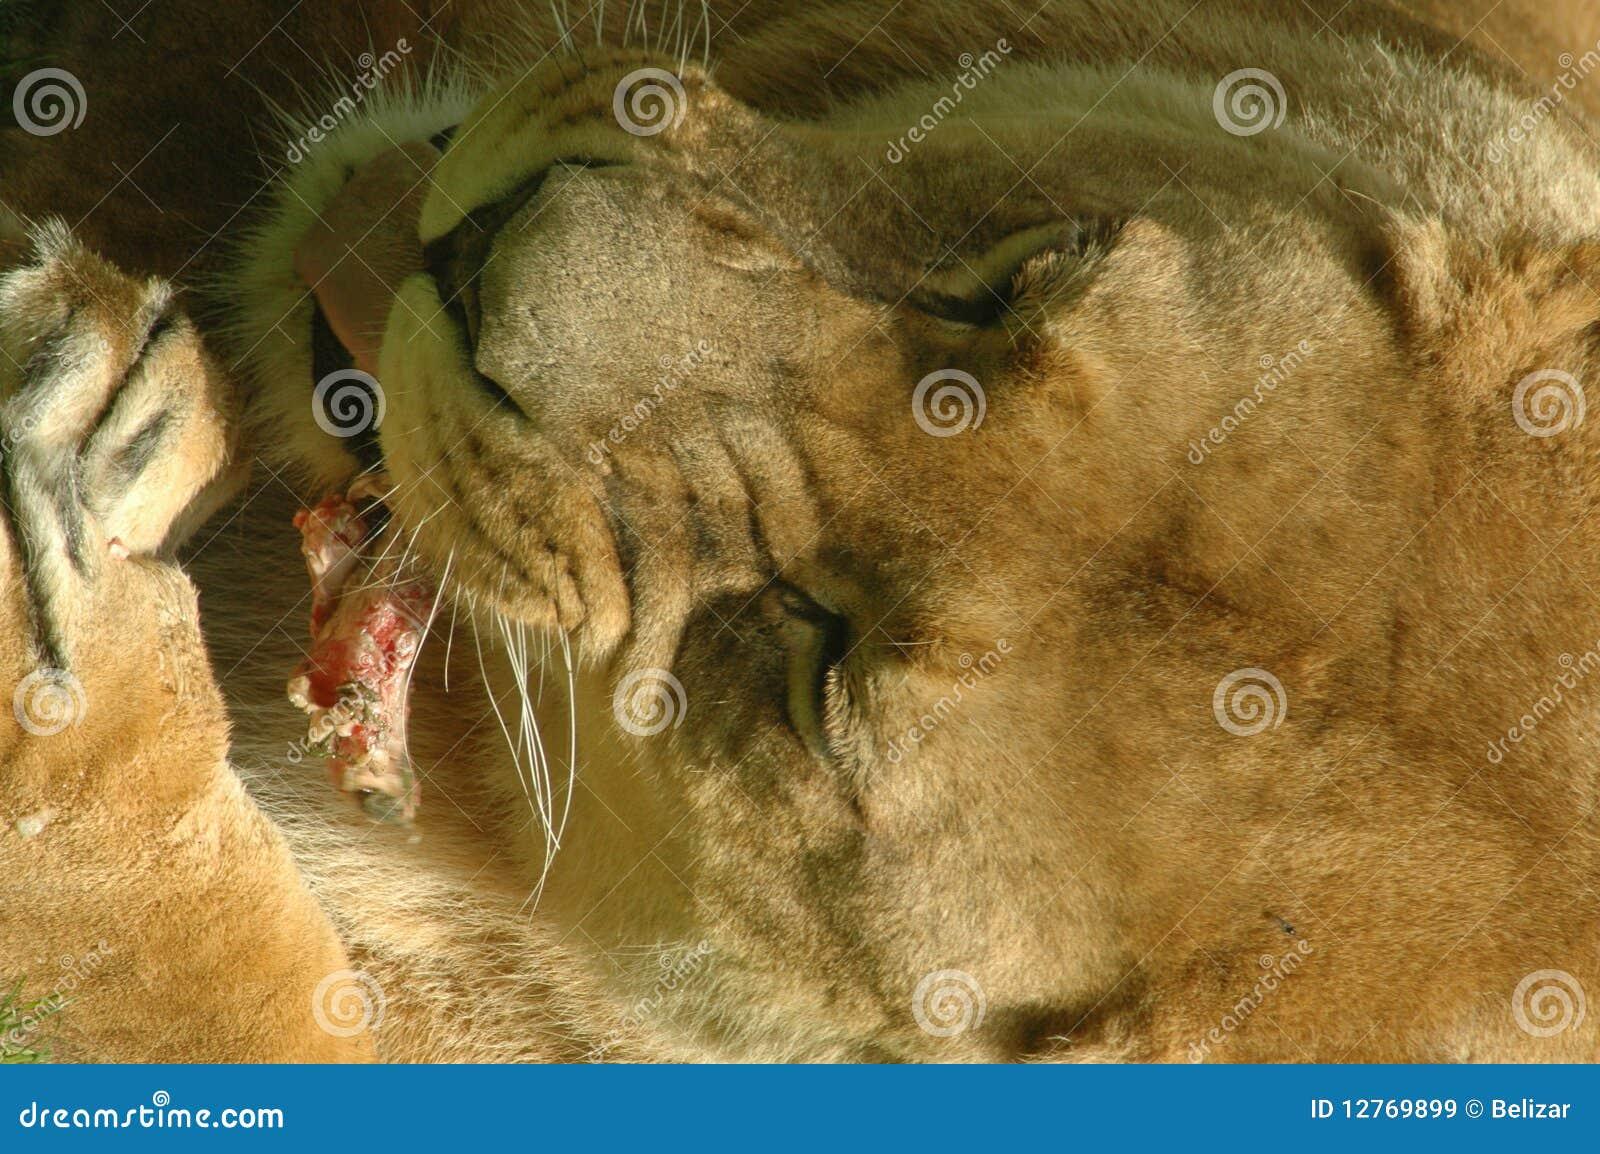 Lioness (Panthera leo) dinner